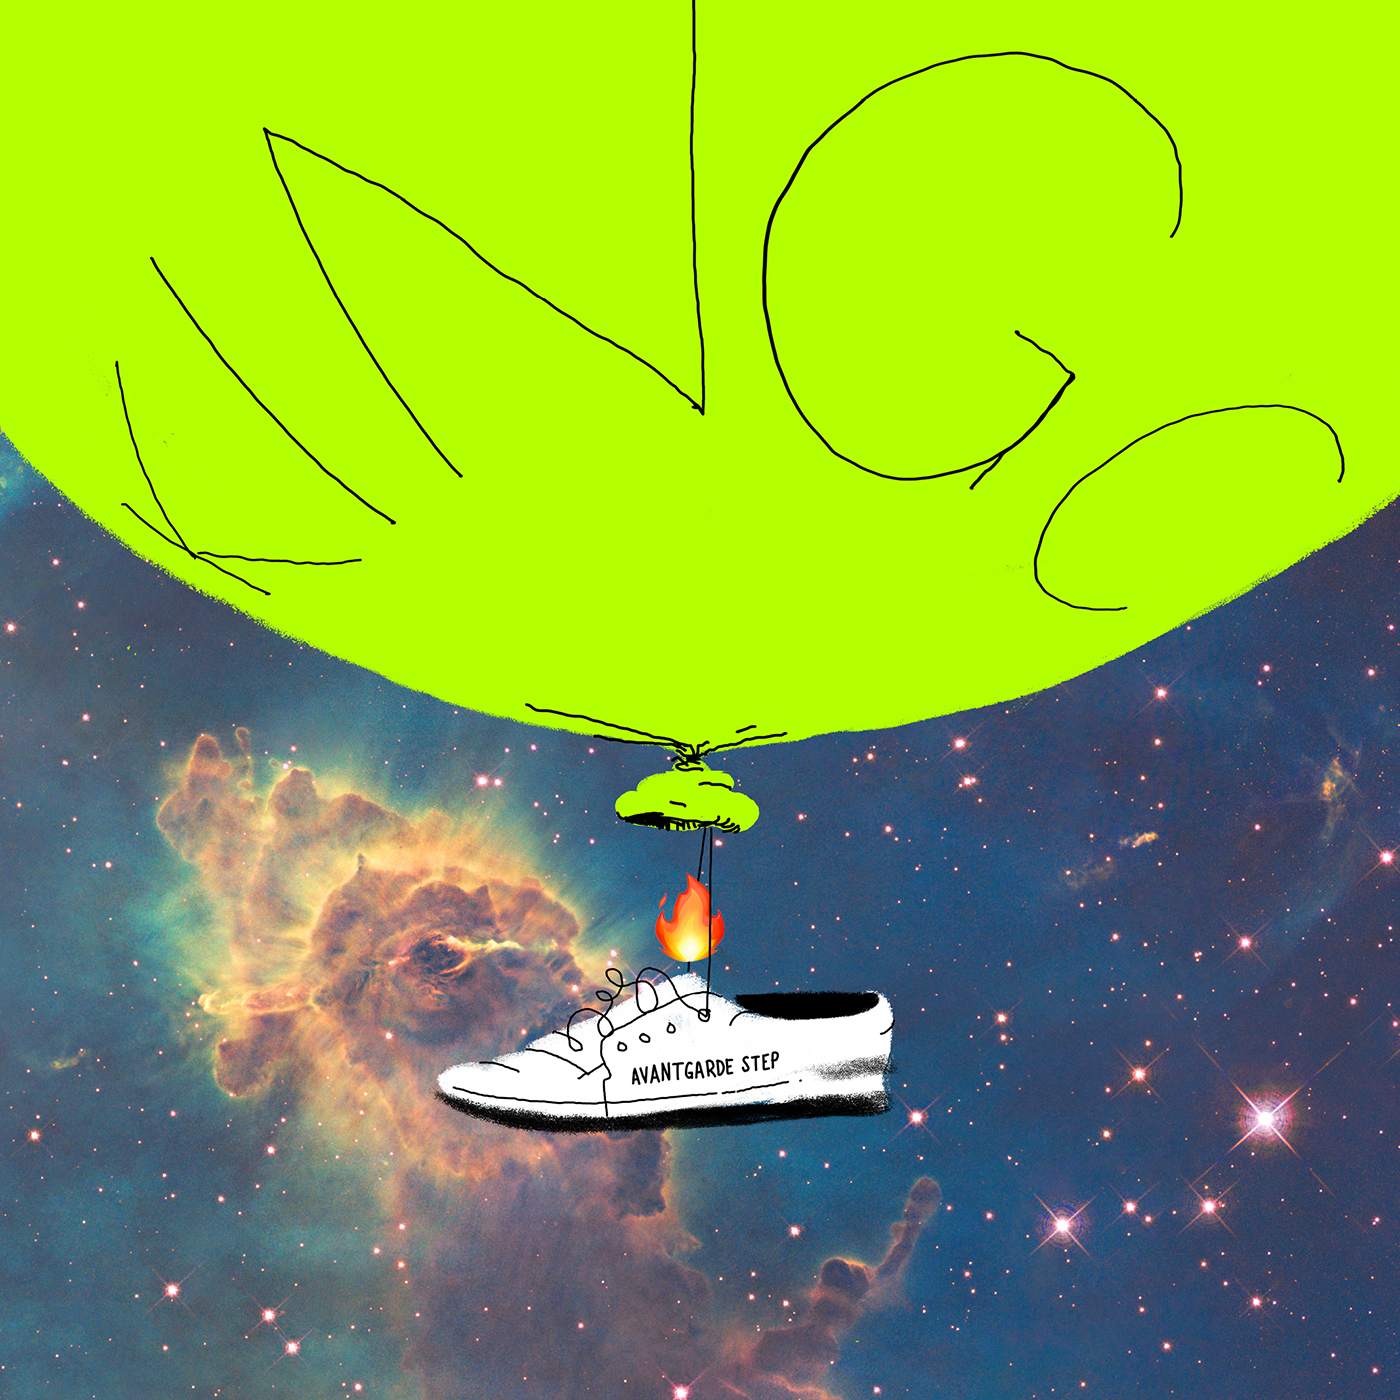 Albumcover Avantgarde Step, KING C